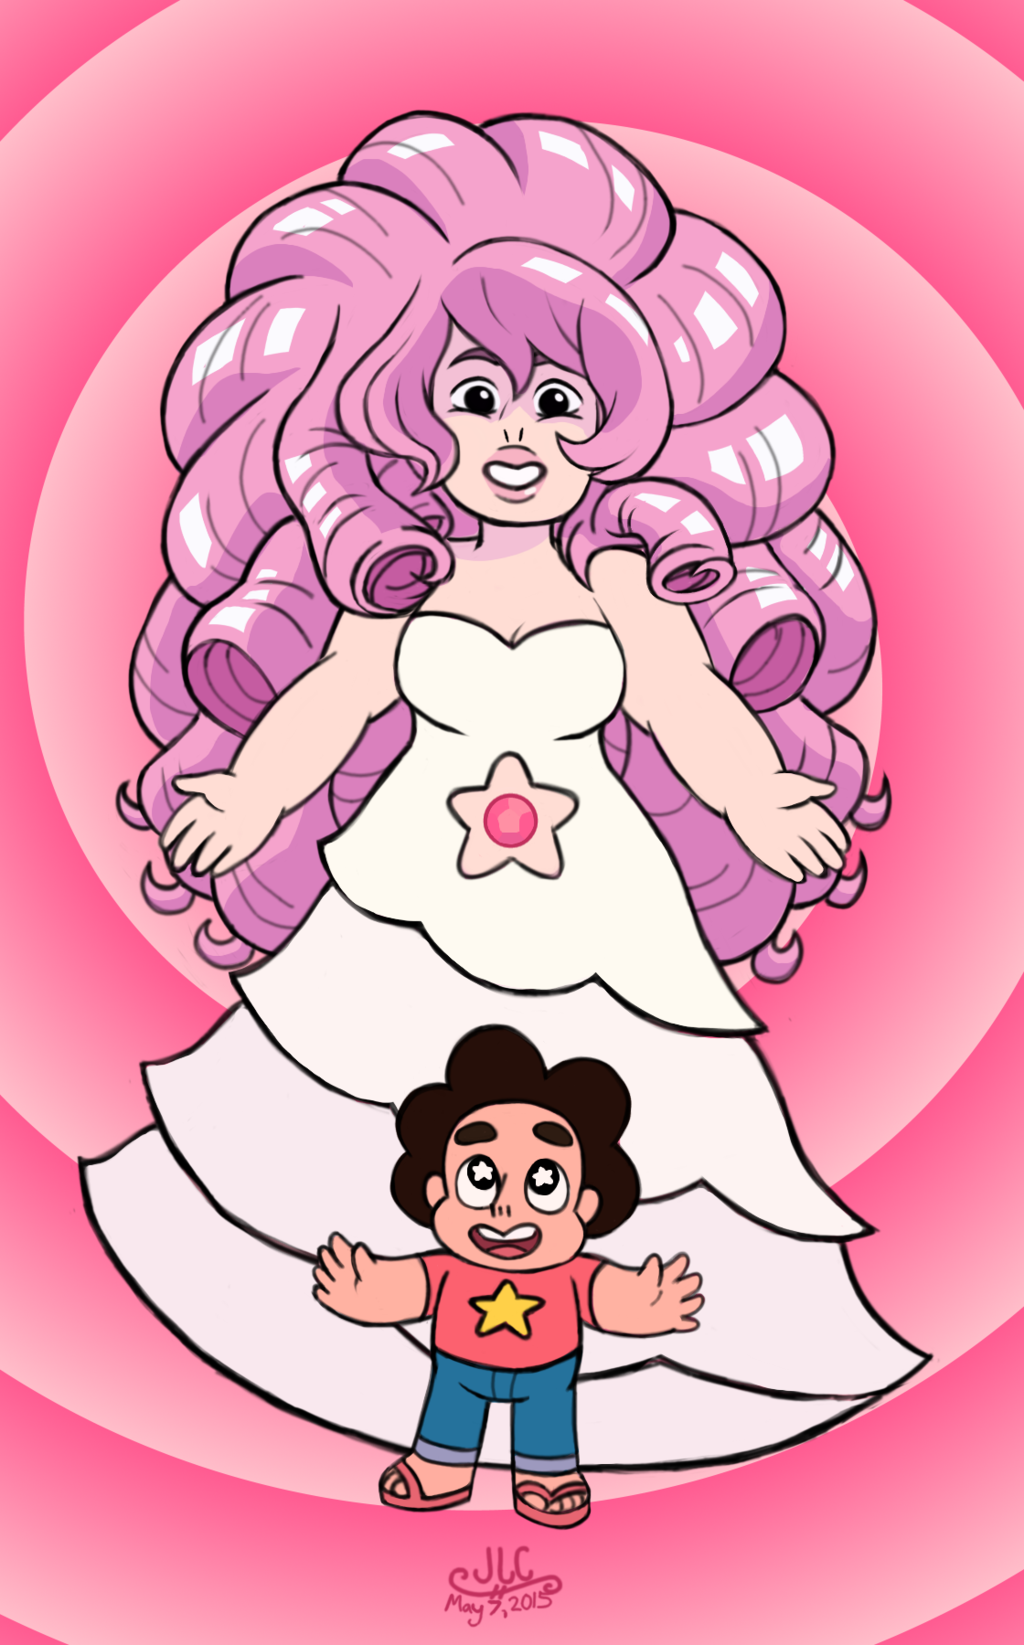 SU - Steven Universe + Rose Quartz